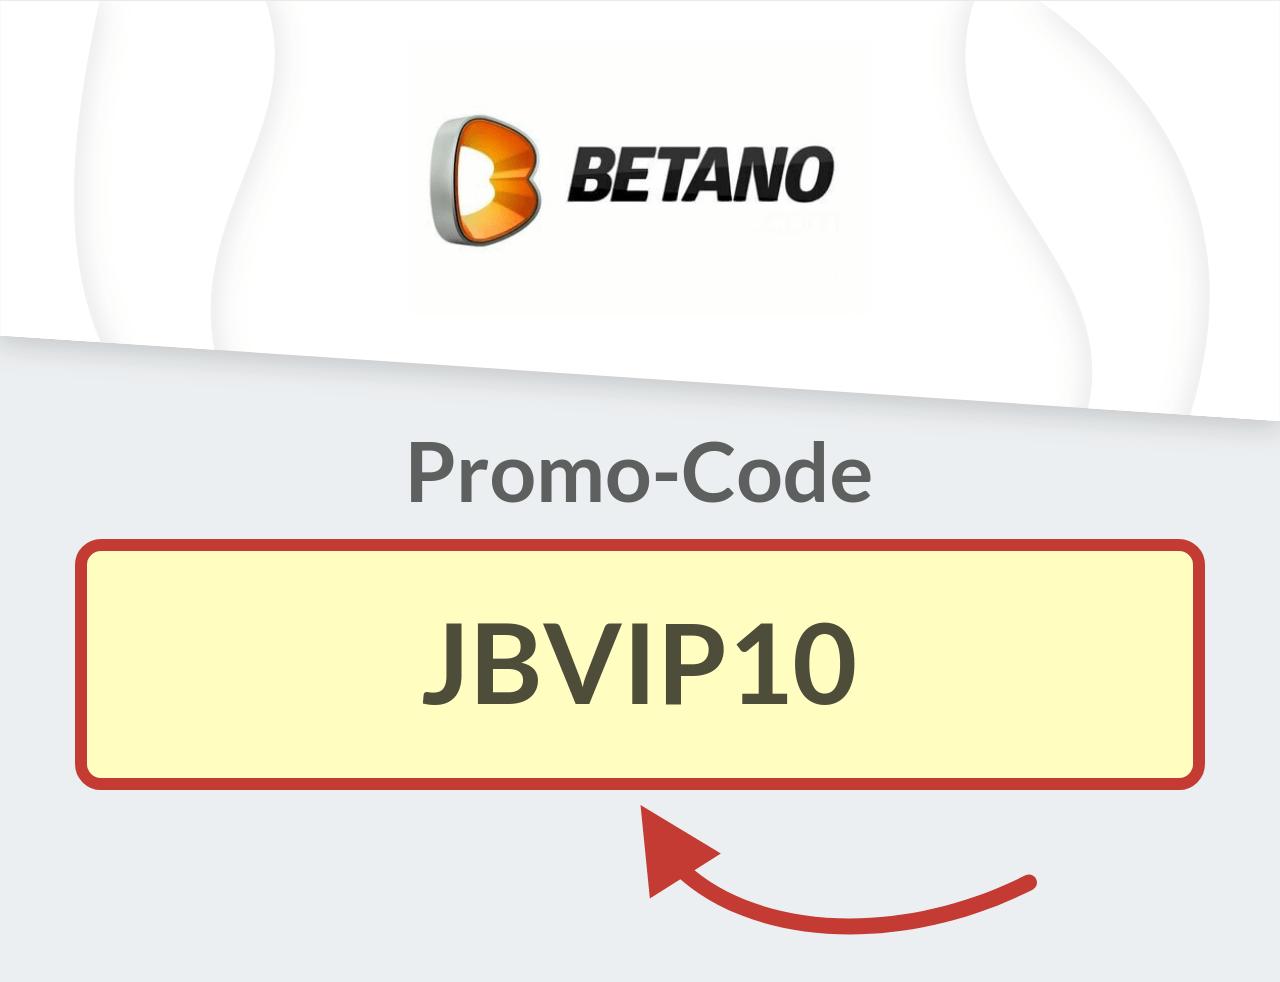 Betano Promo Code